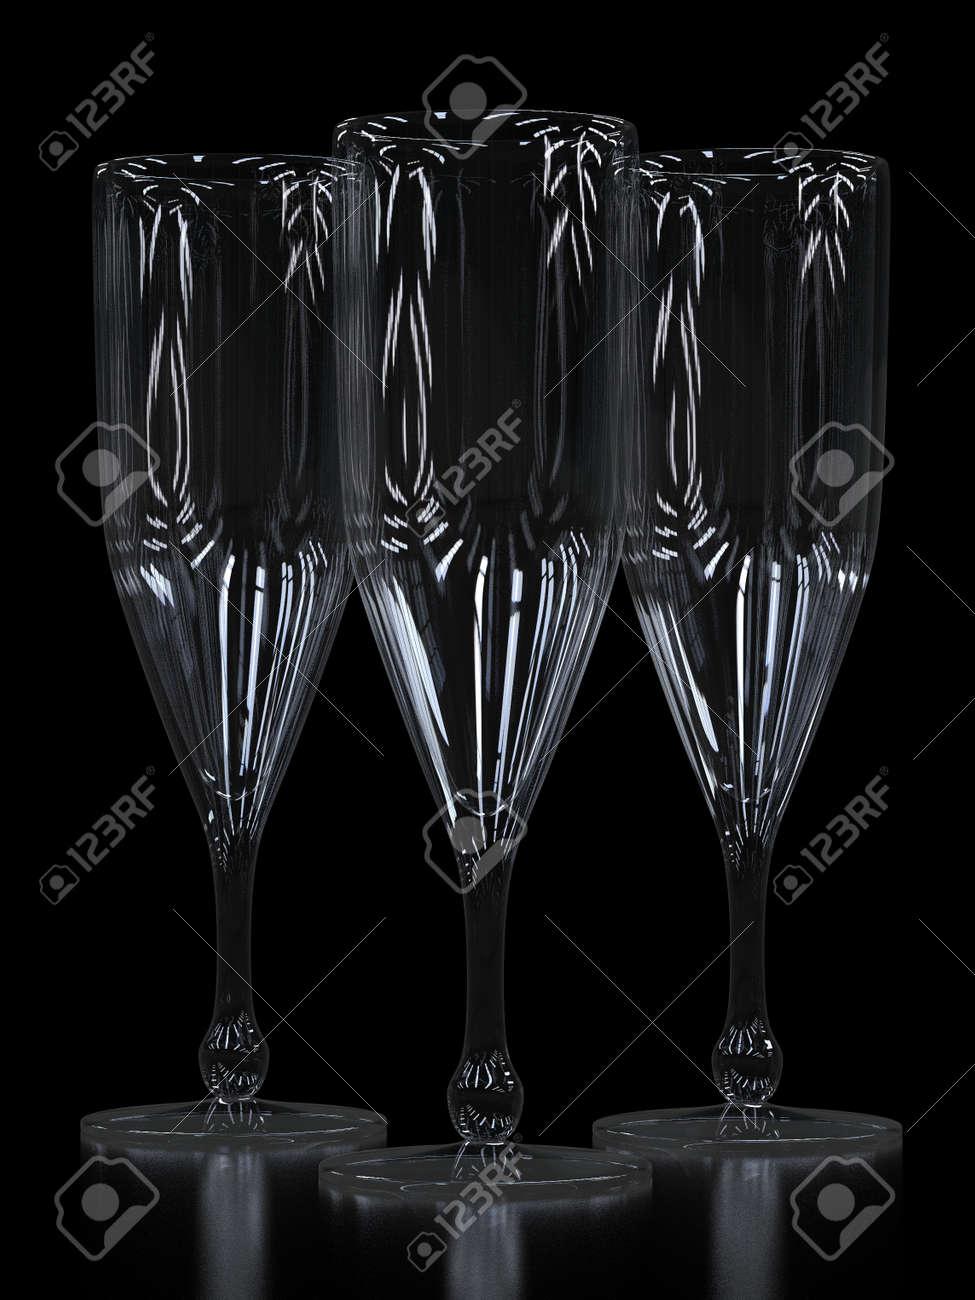 Empty champagne glasses - 12584973